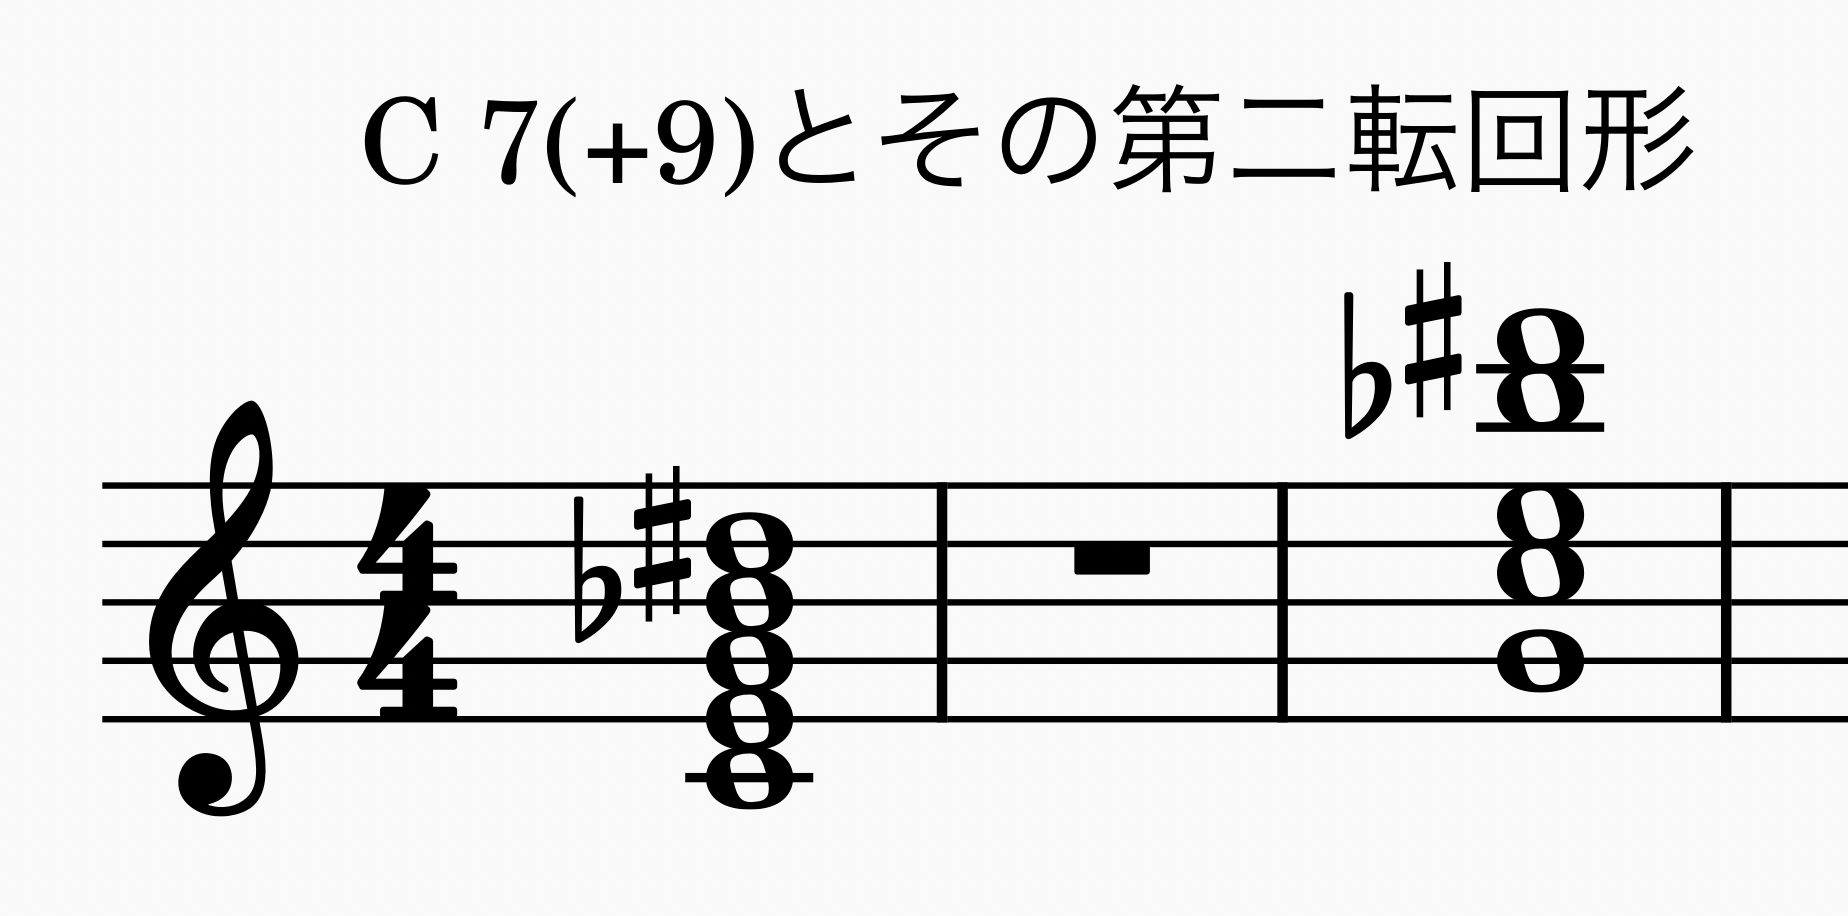 C7(+9)とその第二転回形